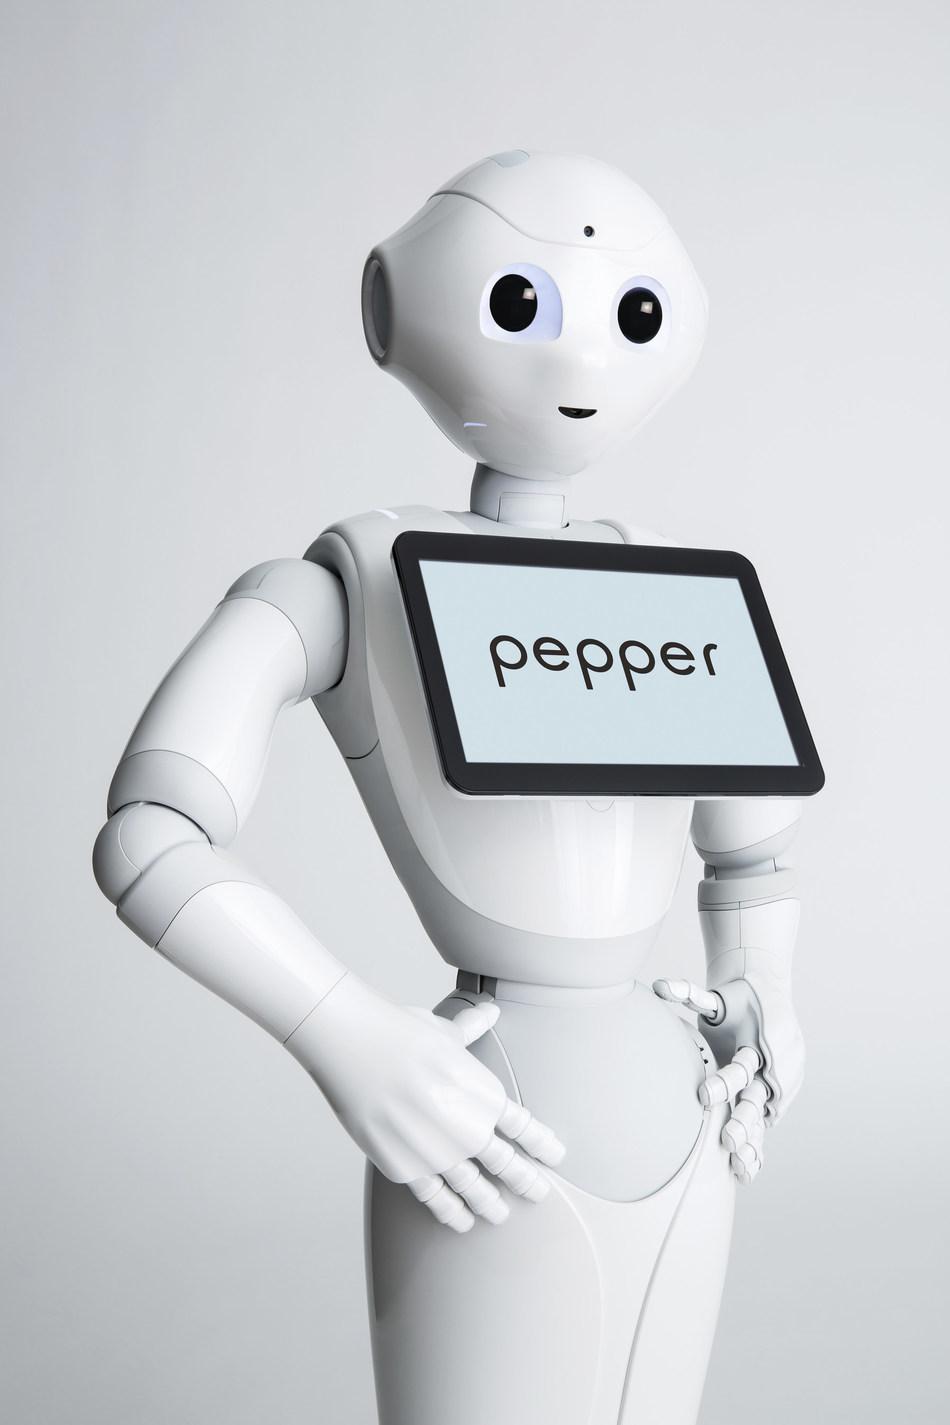 SoftBank Robotic's humanoid robot, Pepper